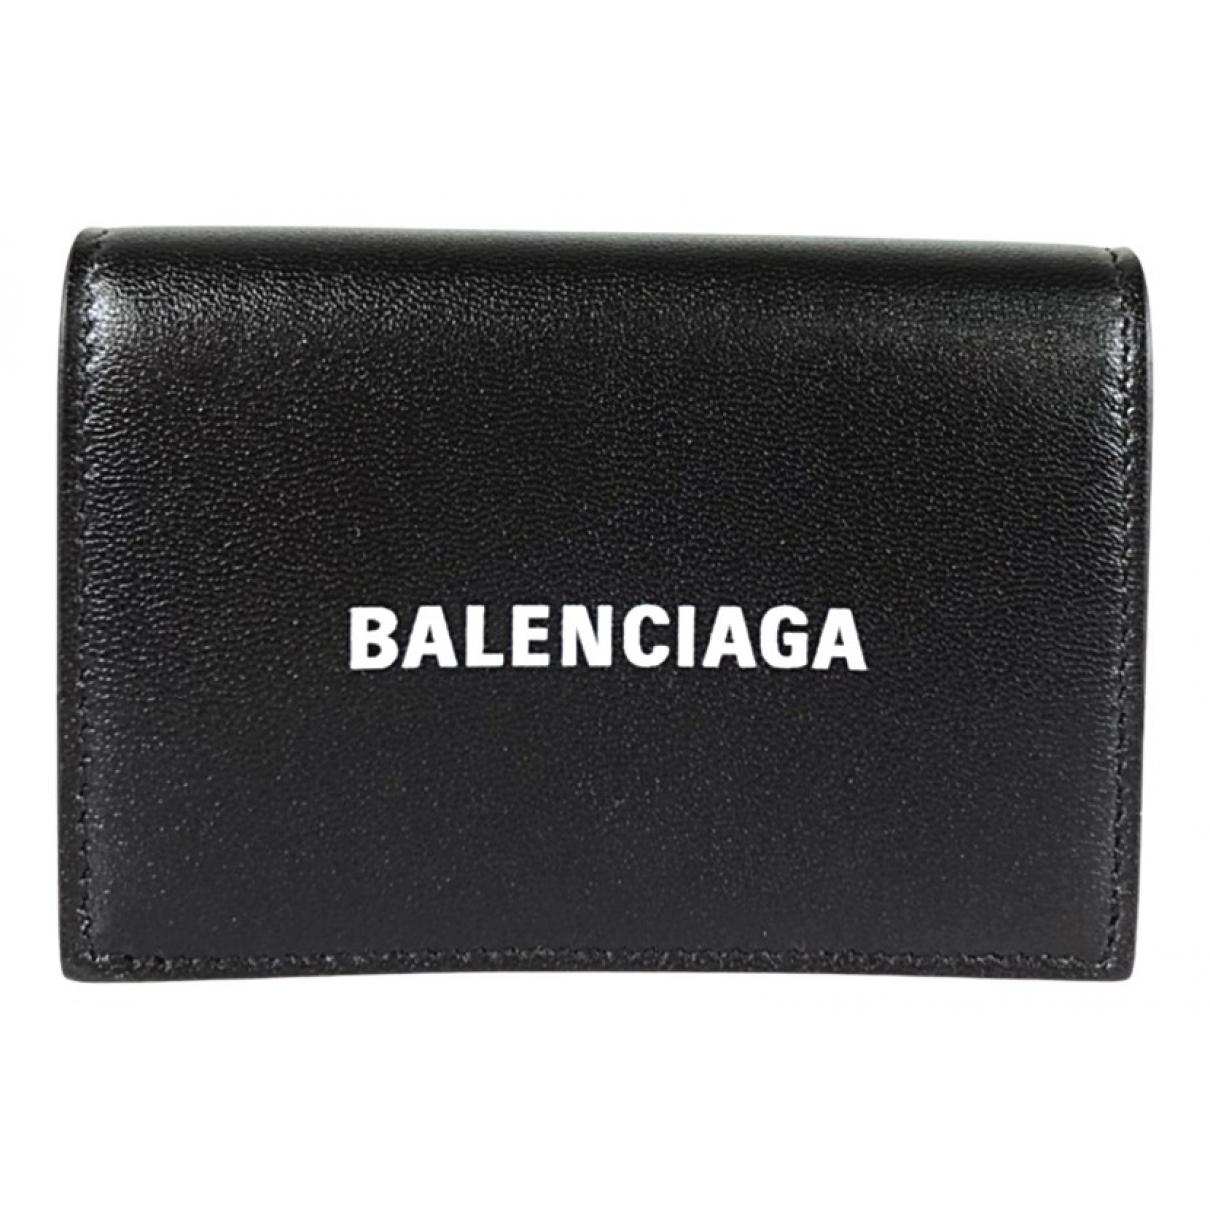 Balenciaga N Black Leather Purses, wallet & cases for Women N